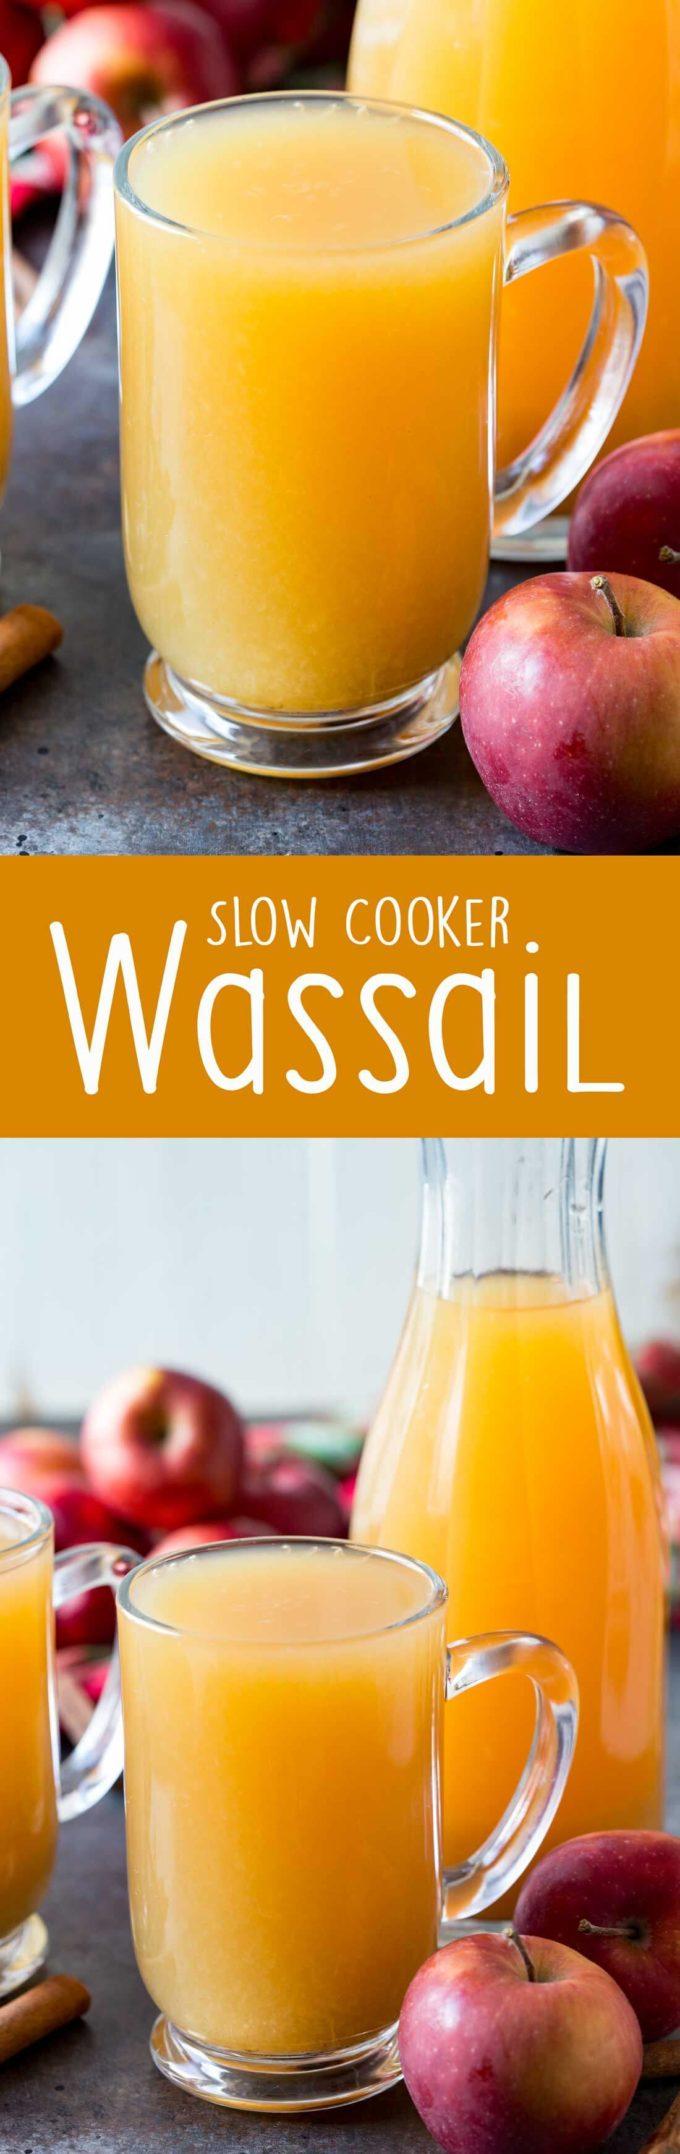 slow-cooker-wassail-PIN